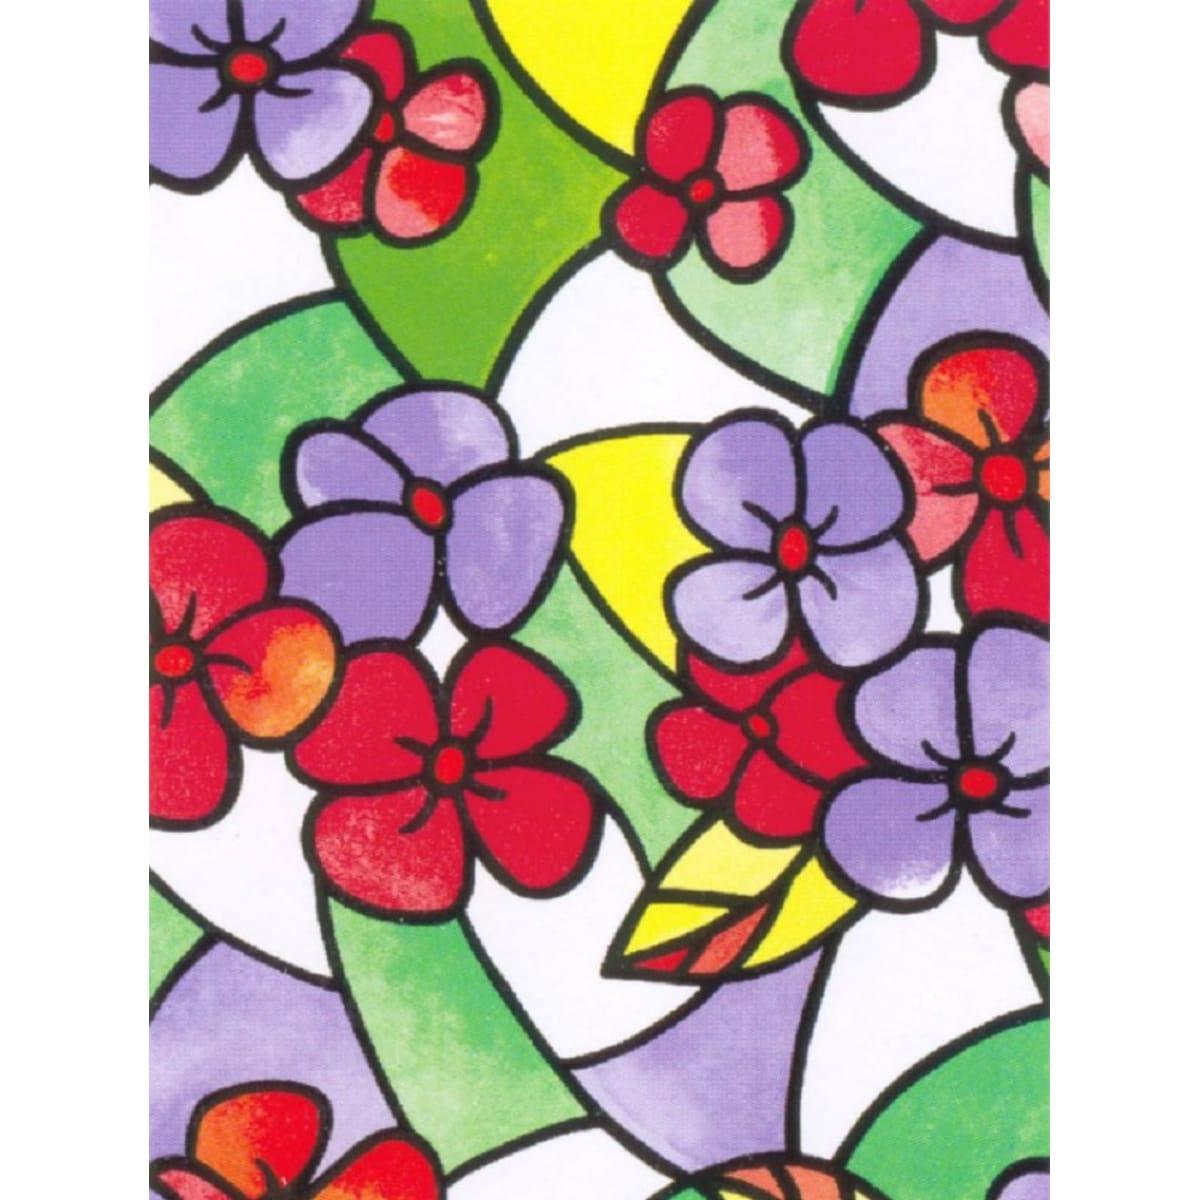 Декоративная самоклеящаяся пленка Color Decor 8544х24 0,45